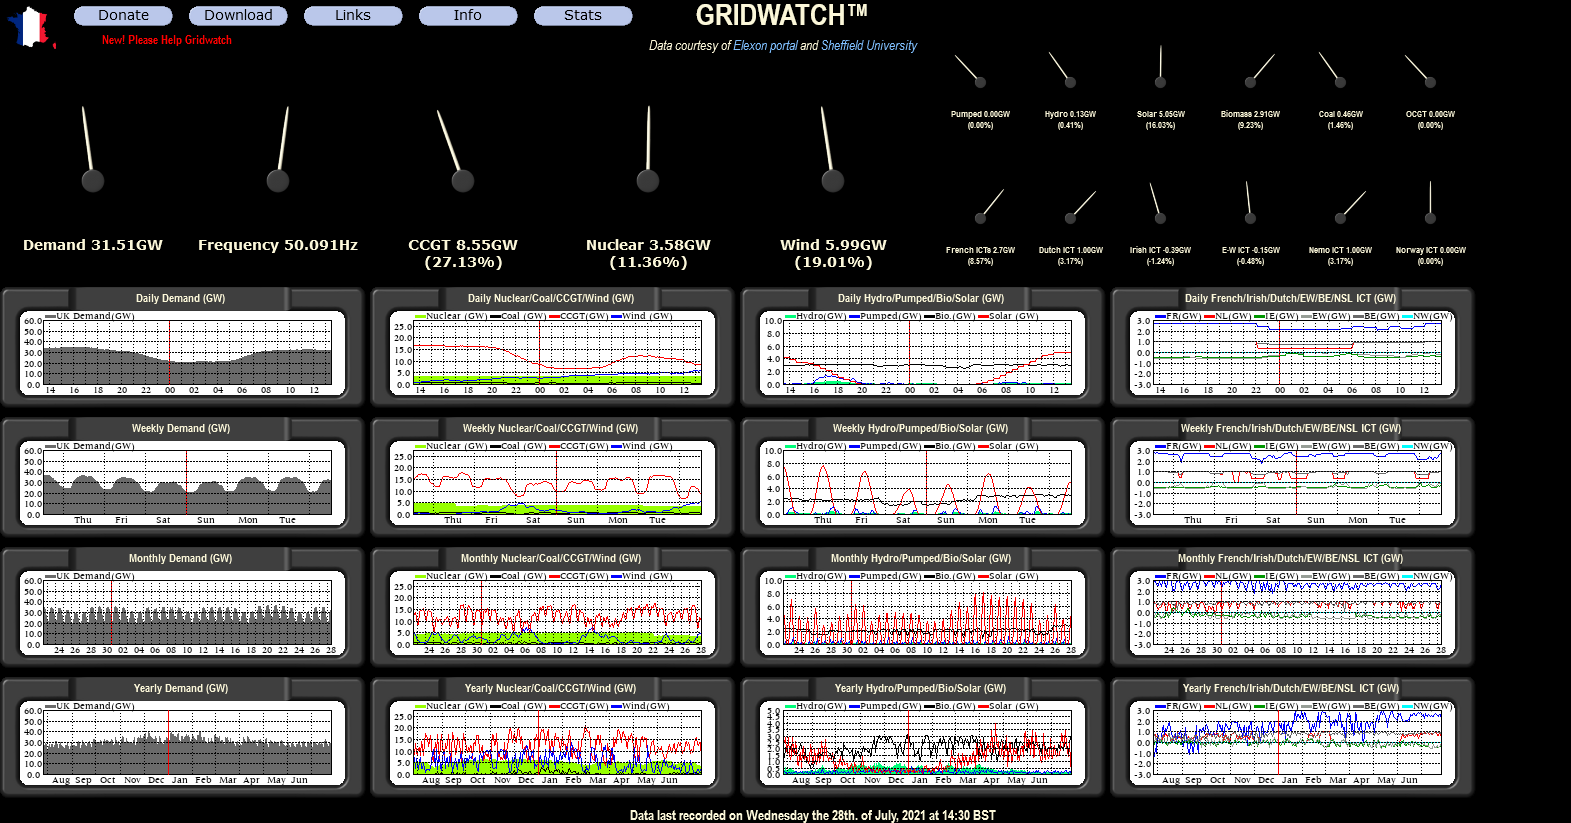 Screenshot 2021-07-28 at 14-38-58 G B National Grid status.png